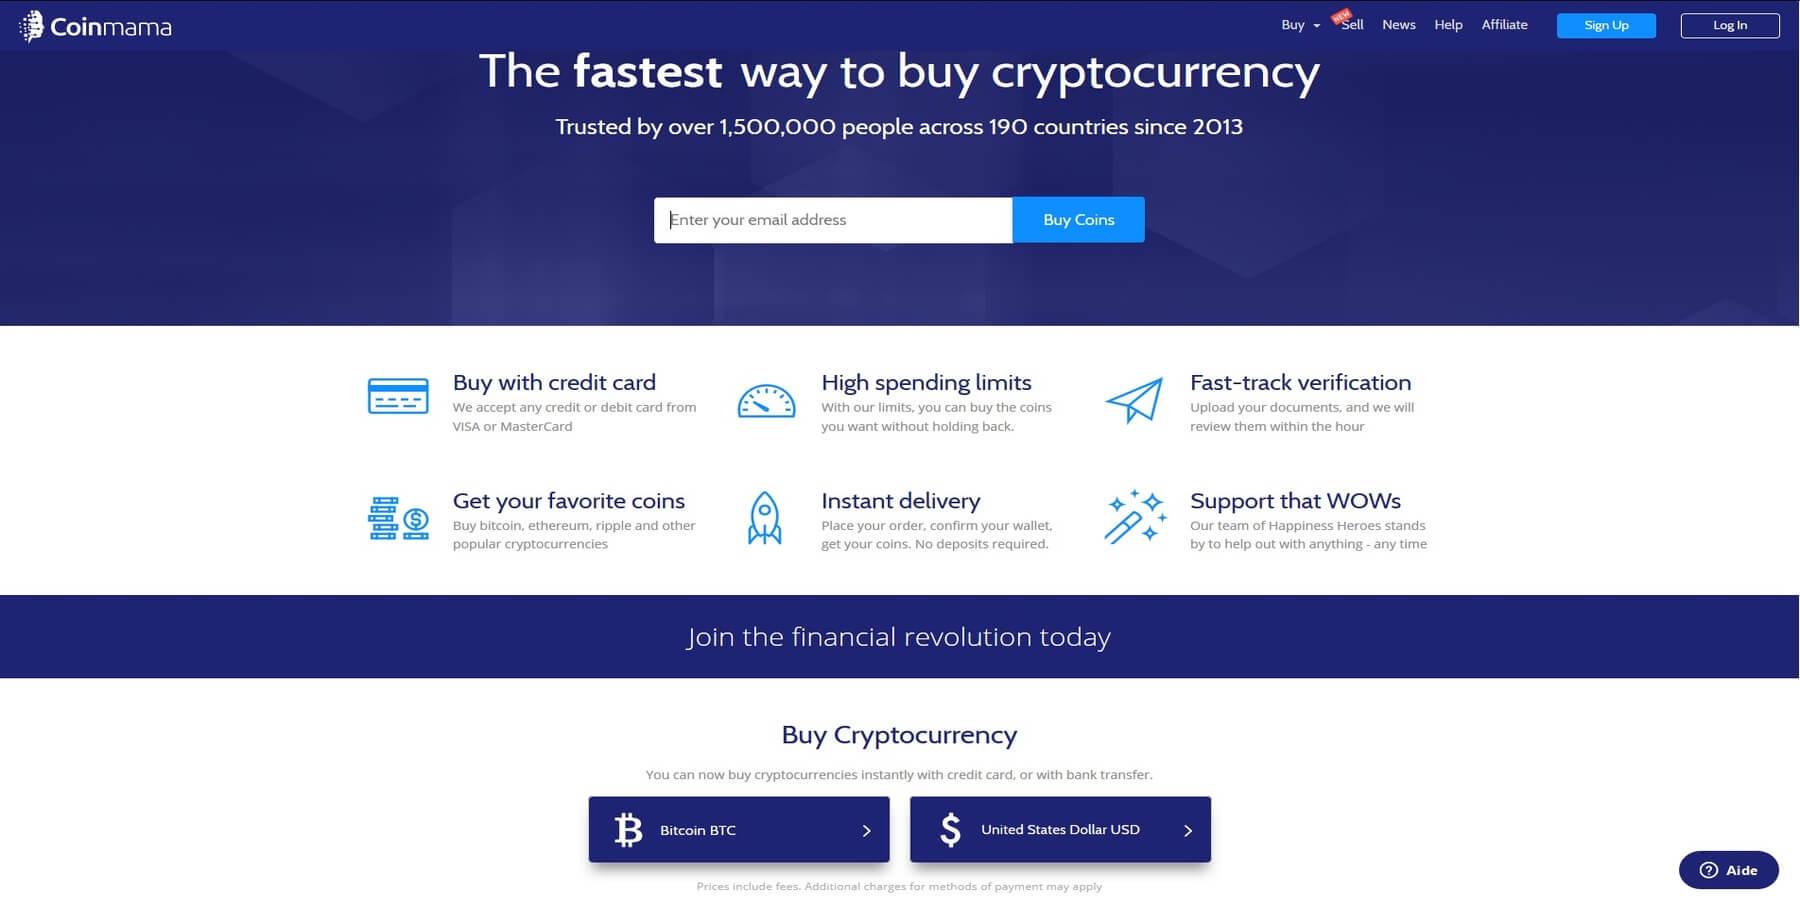 Acheter des cryptomonnaies chez Coinmama